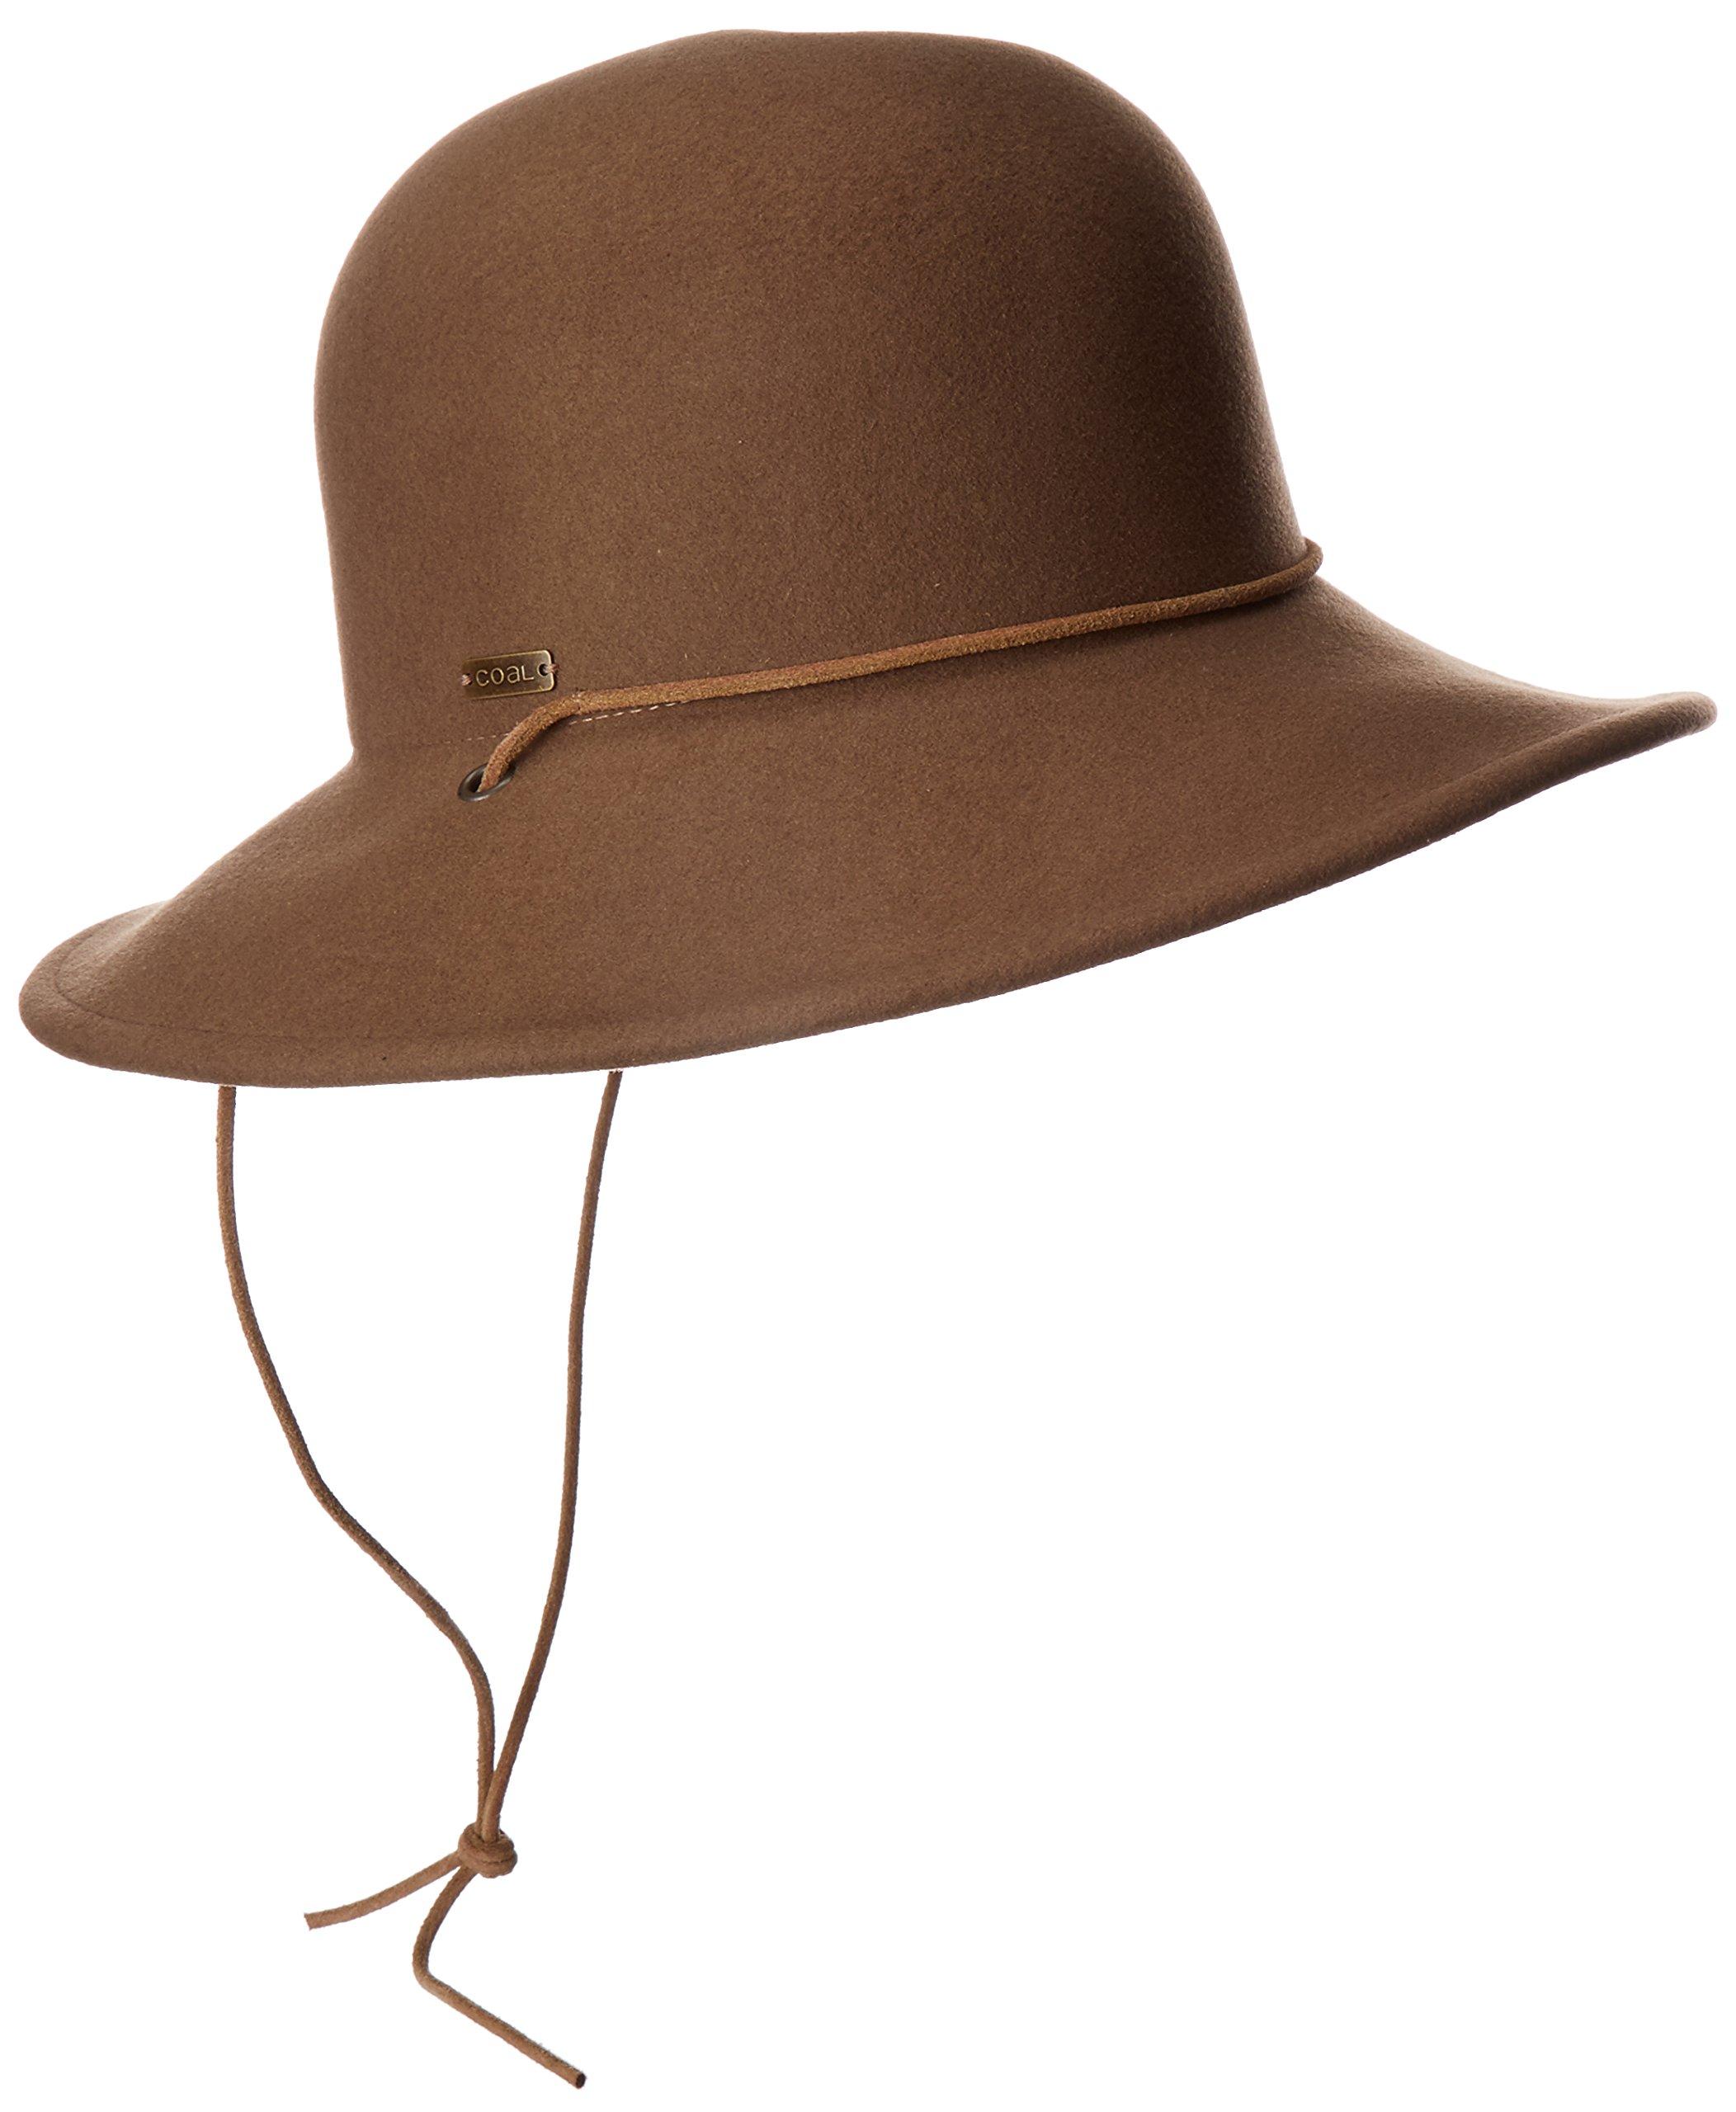 Coal Women's The Waverly Wool Felt Hat, Light Brown, M